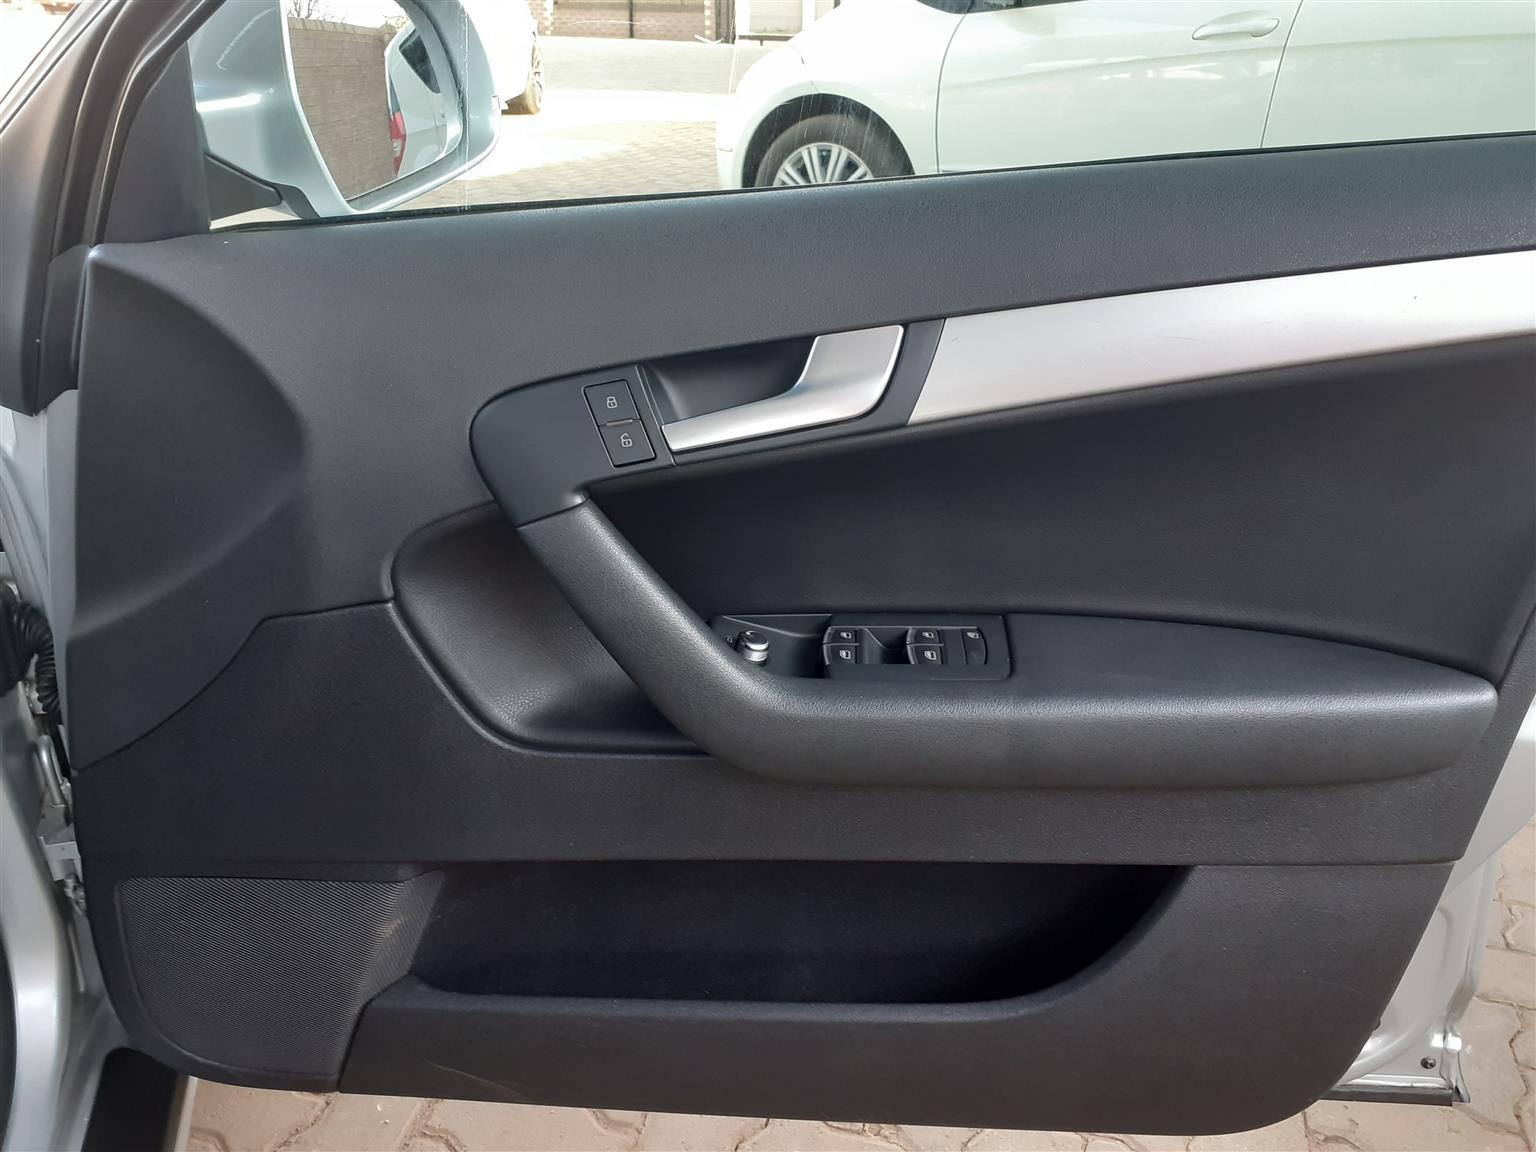 2012 Audi A3 Sportback 1.8T quattro